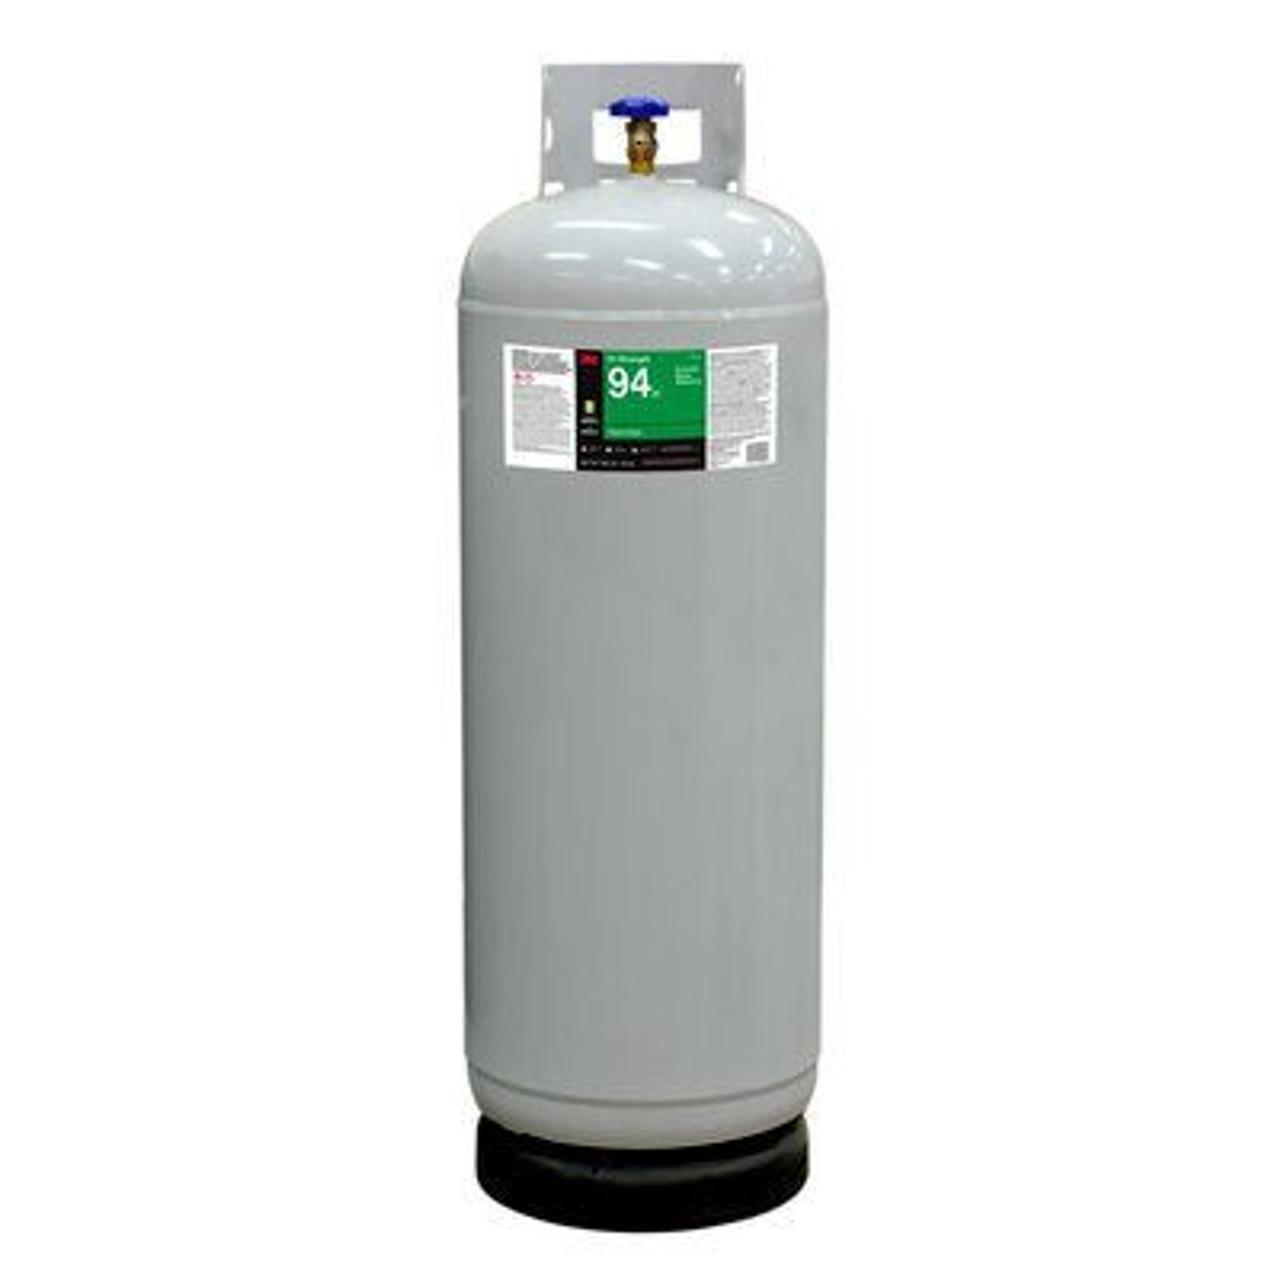 3M™ Hi-Strength 94 ET Cylinder Spray Adhesive, Red, Intermediate Cylinder (Net Wt 128 lb)